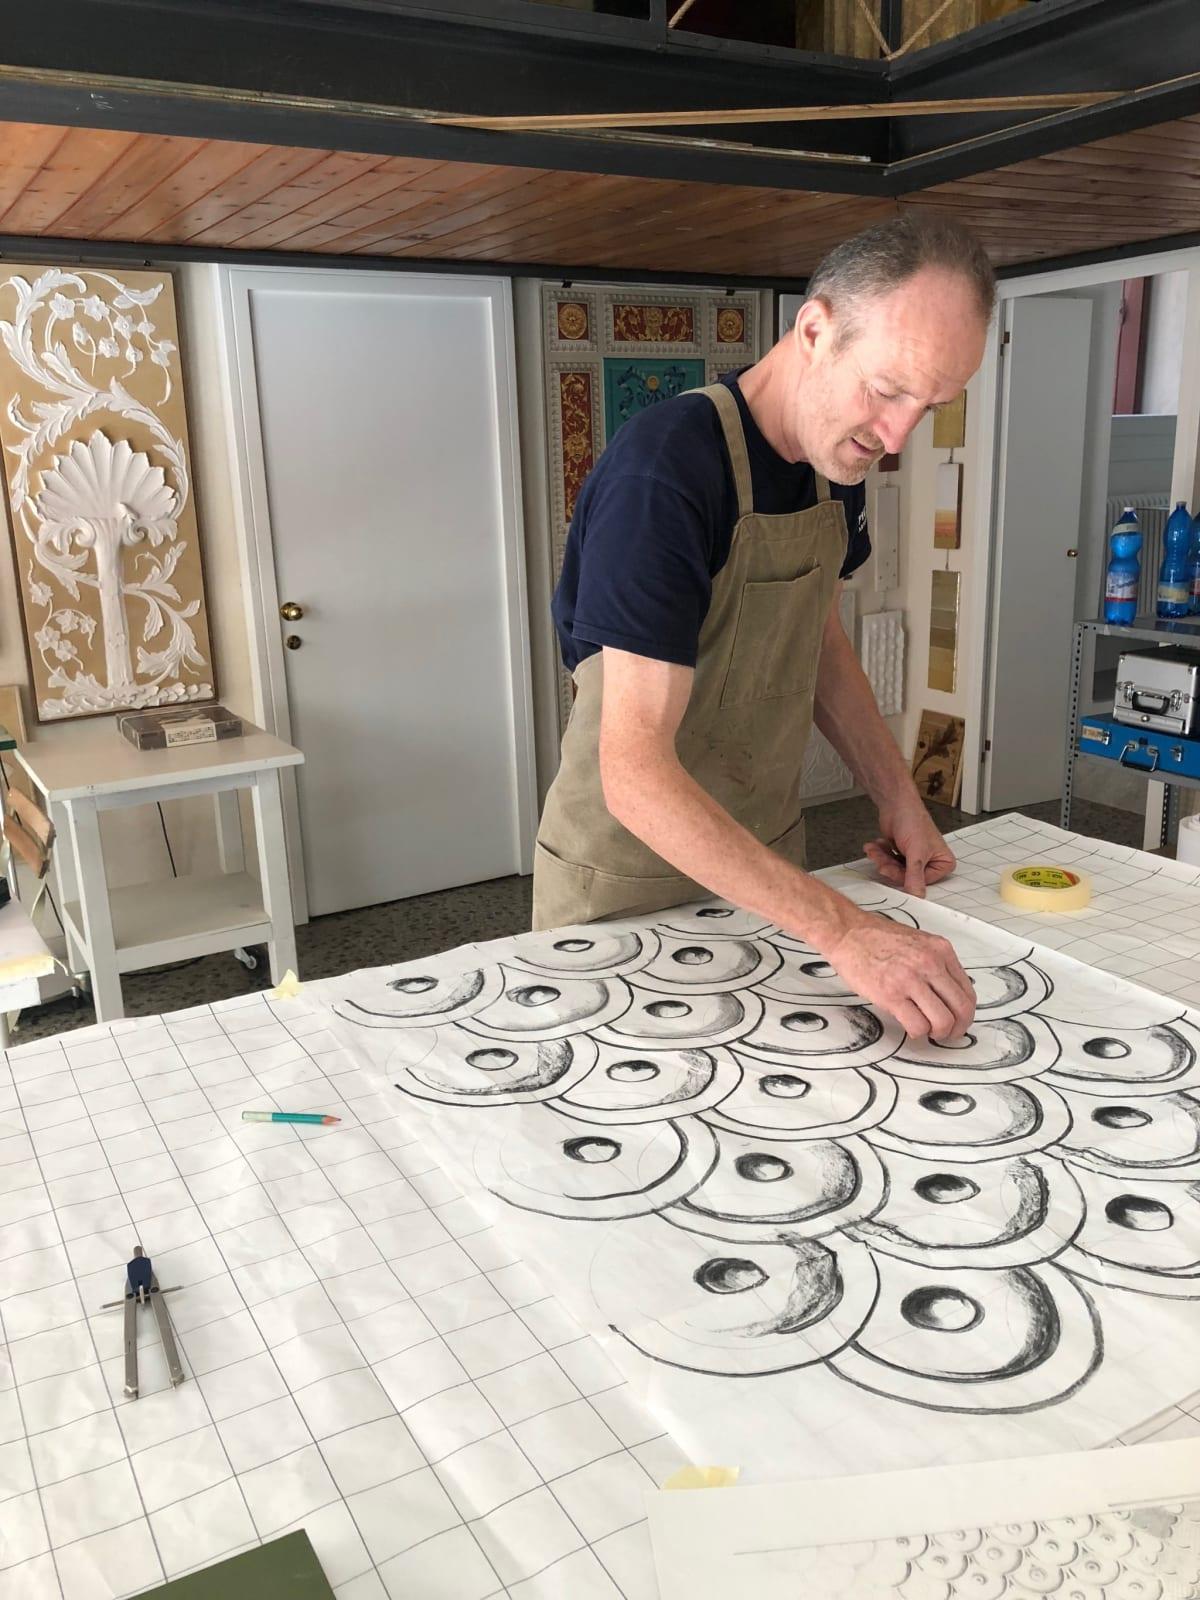 bas-relief-sculpture-material-marmorino-design-studio-pigmentti